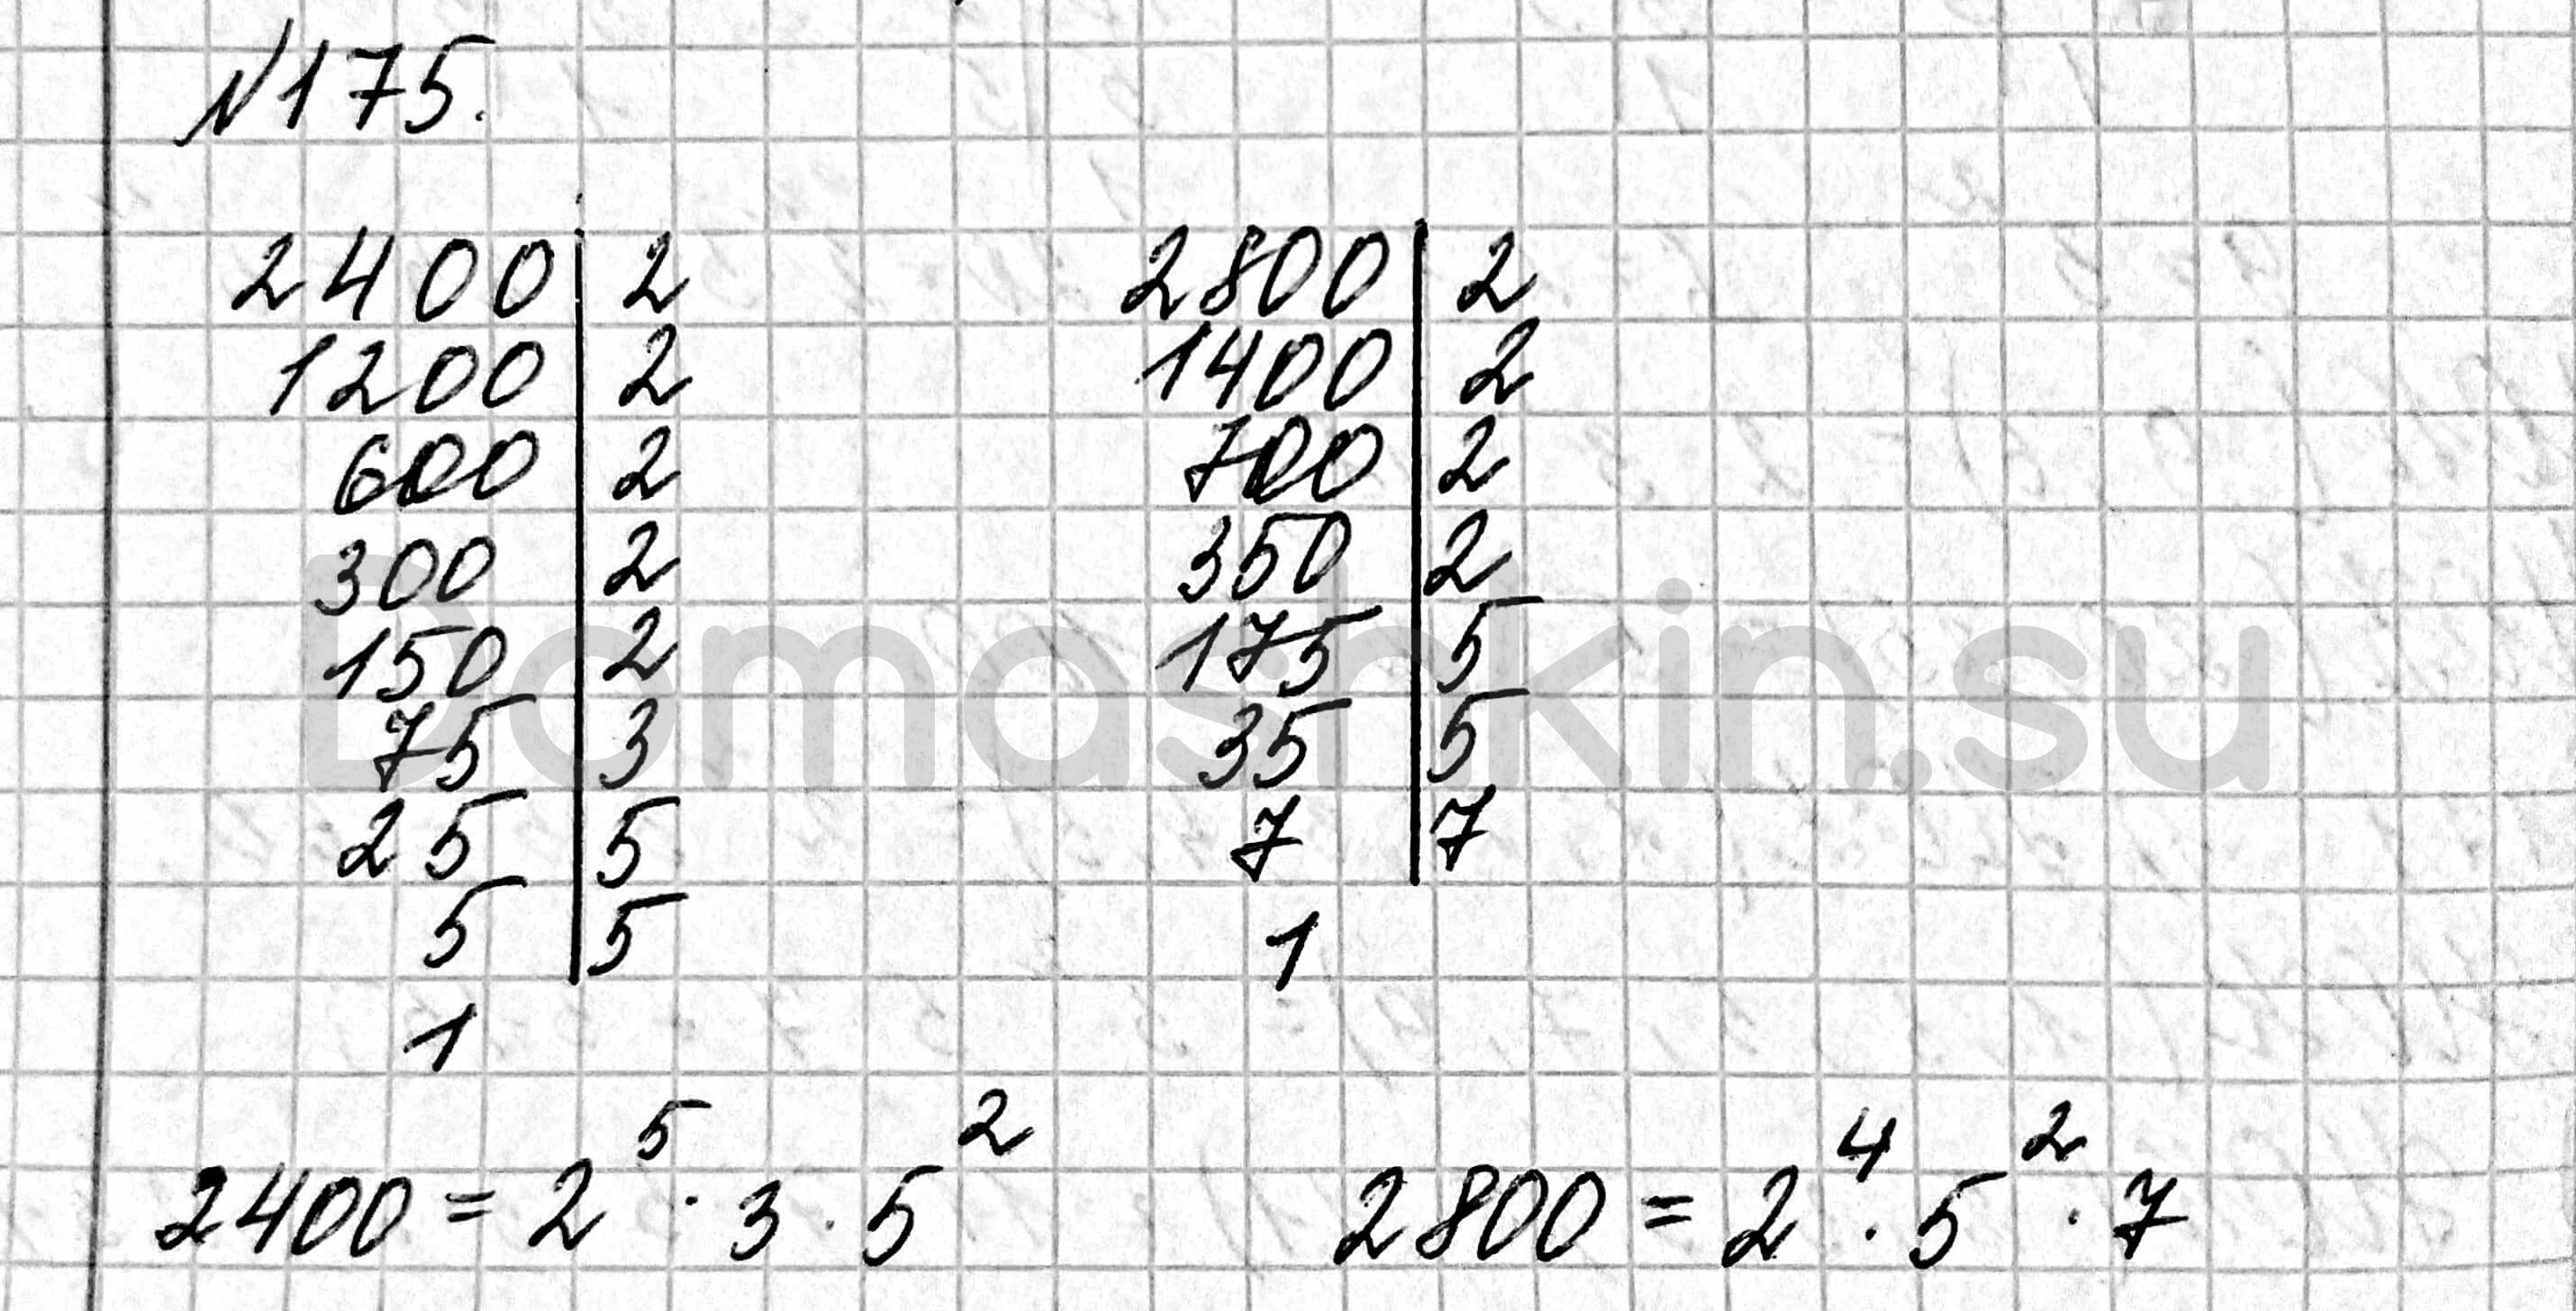 Математика 6 класс учебник Мерзляк номер 175 решение